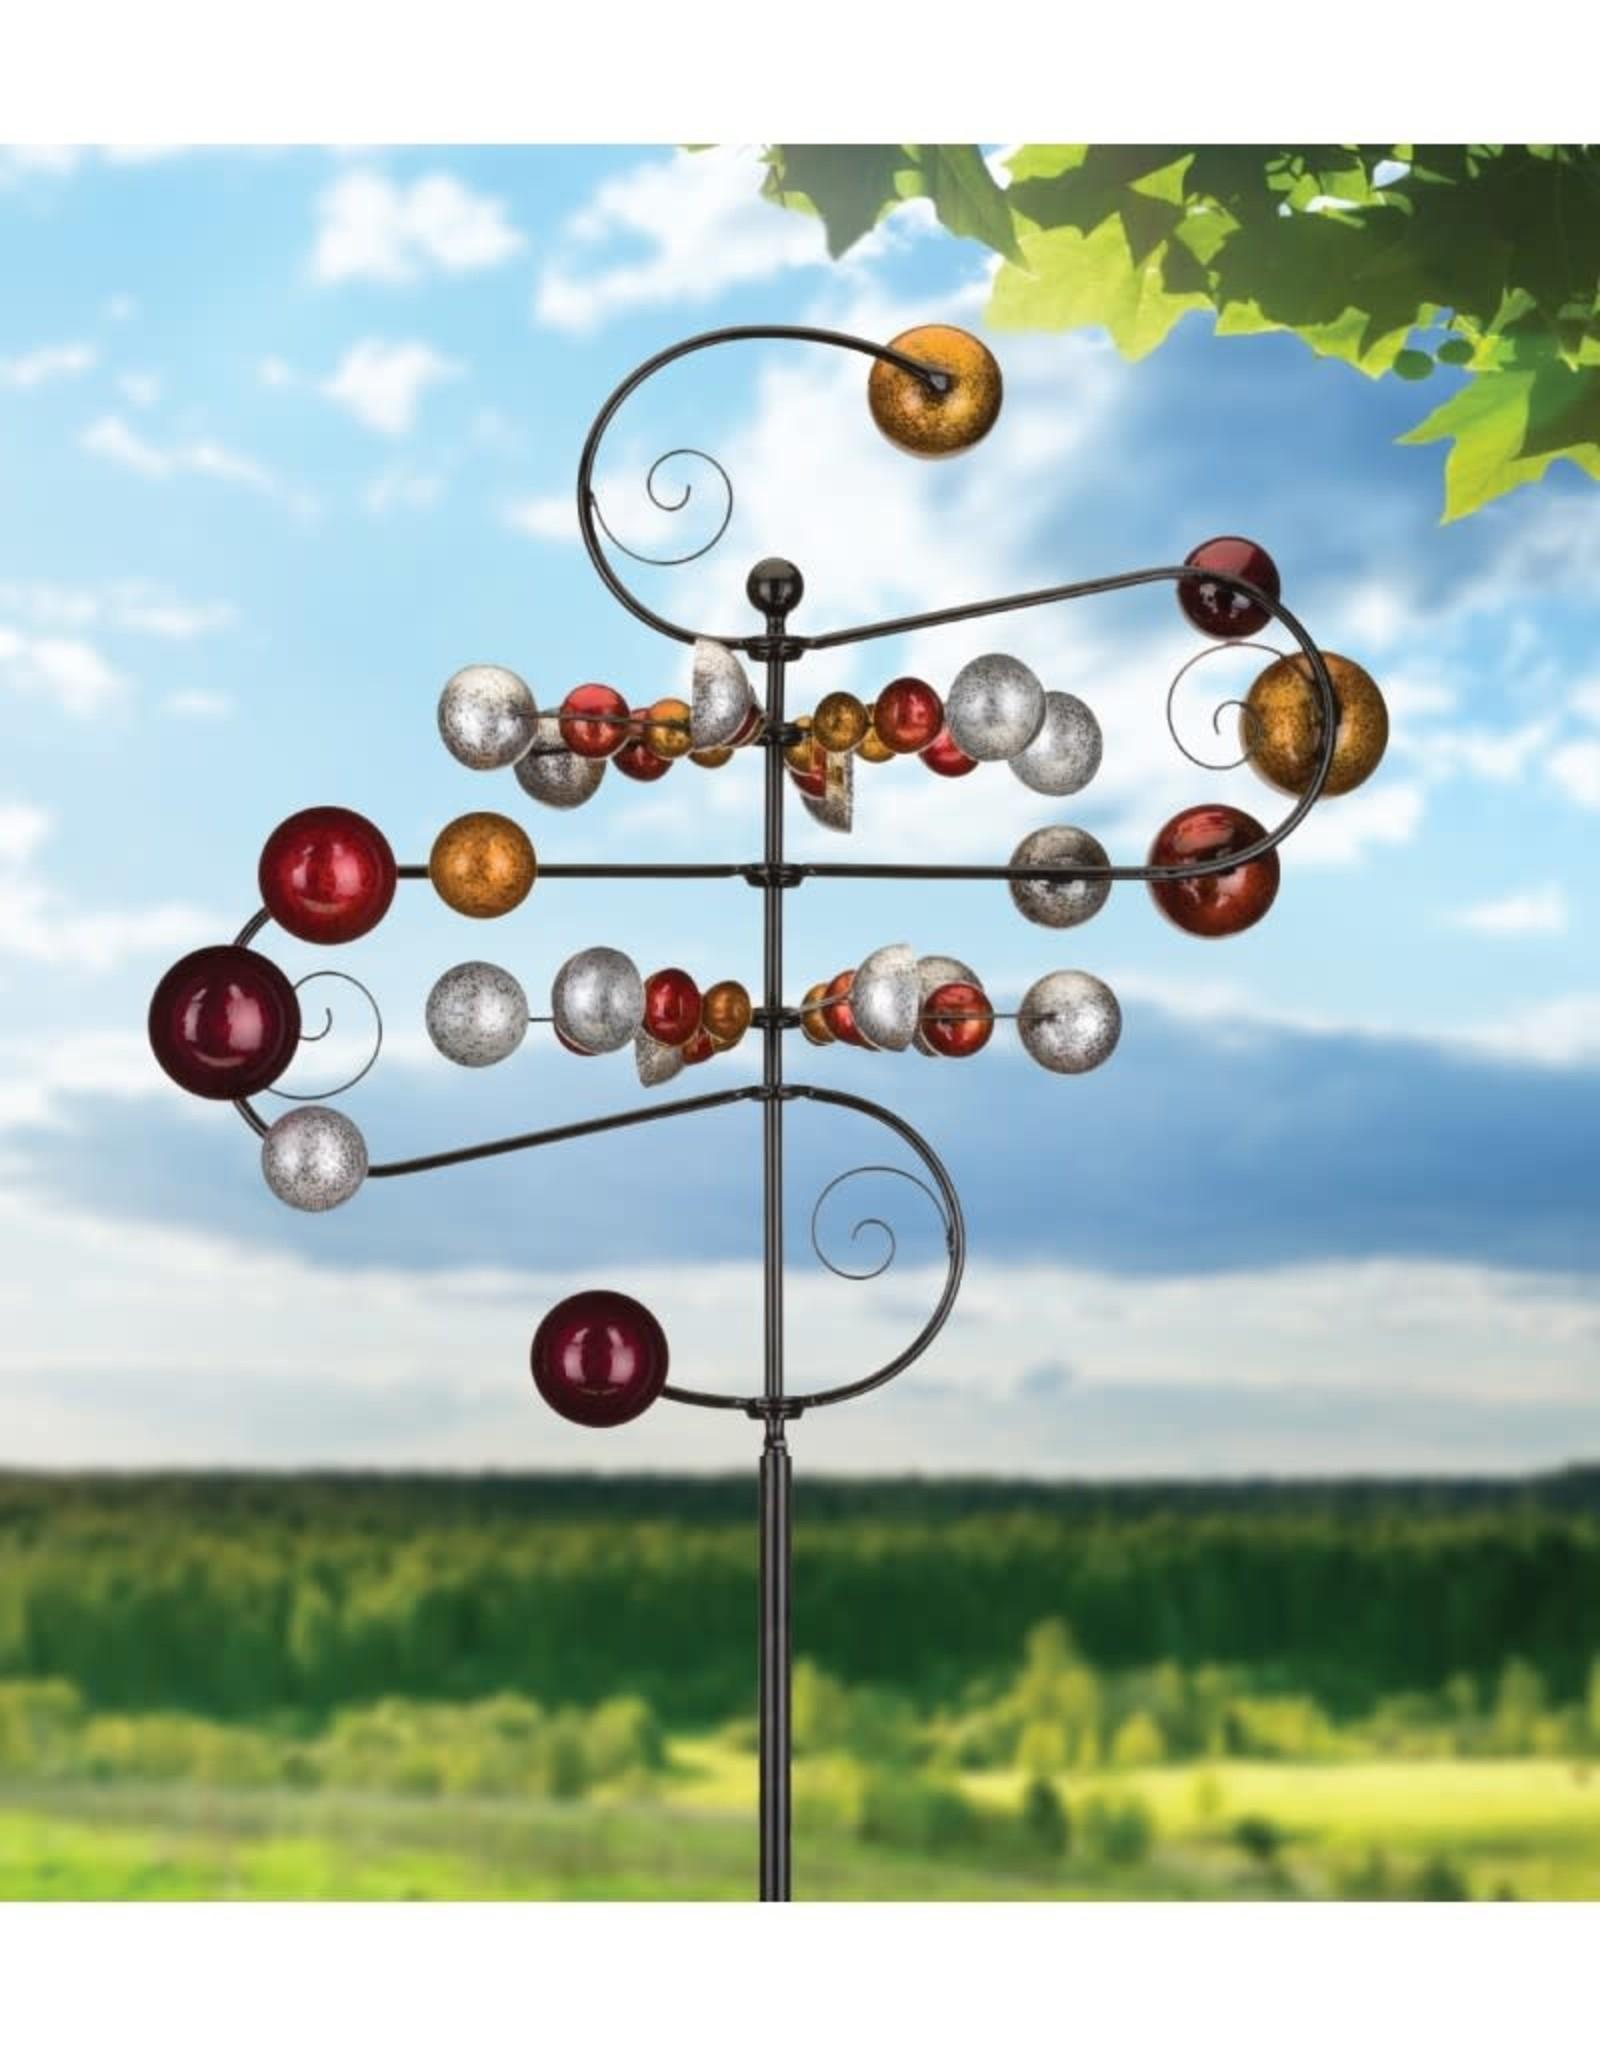 Kinetic Wind Spinner Stake - Stellar Cups & Swirls